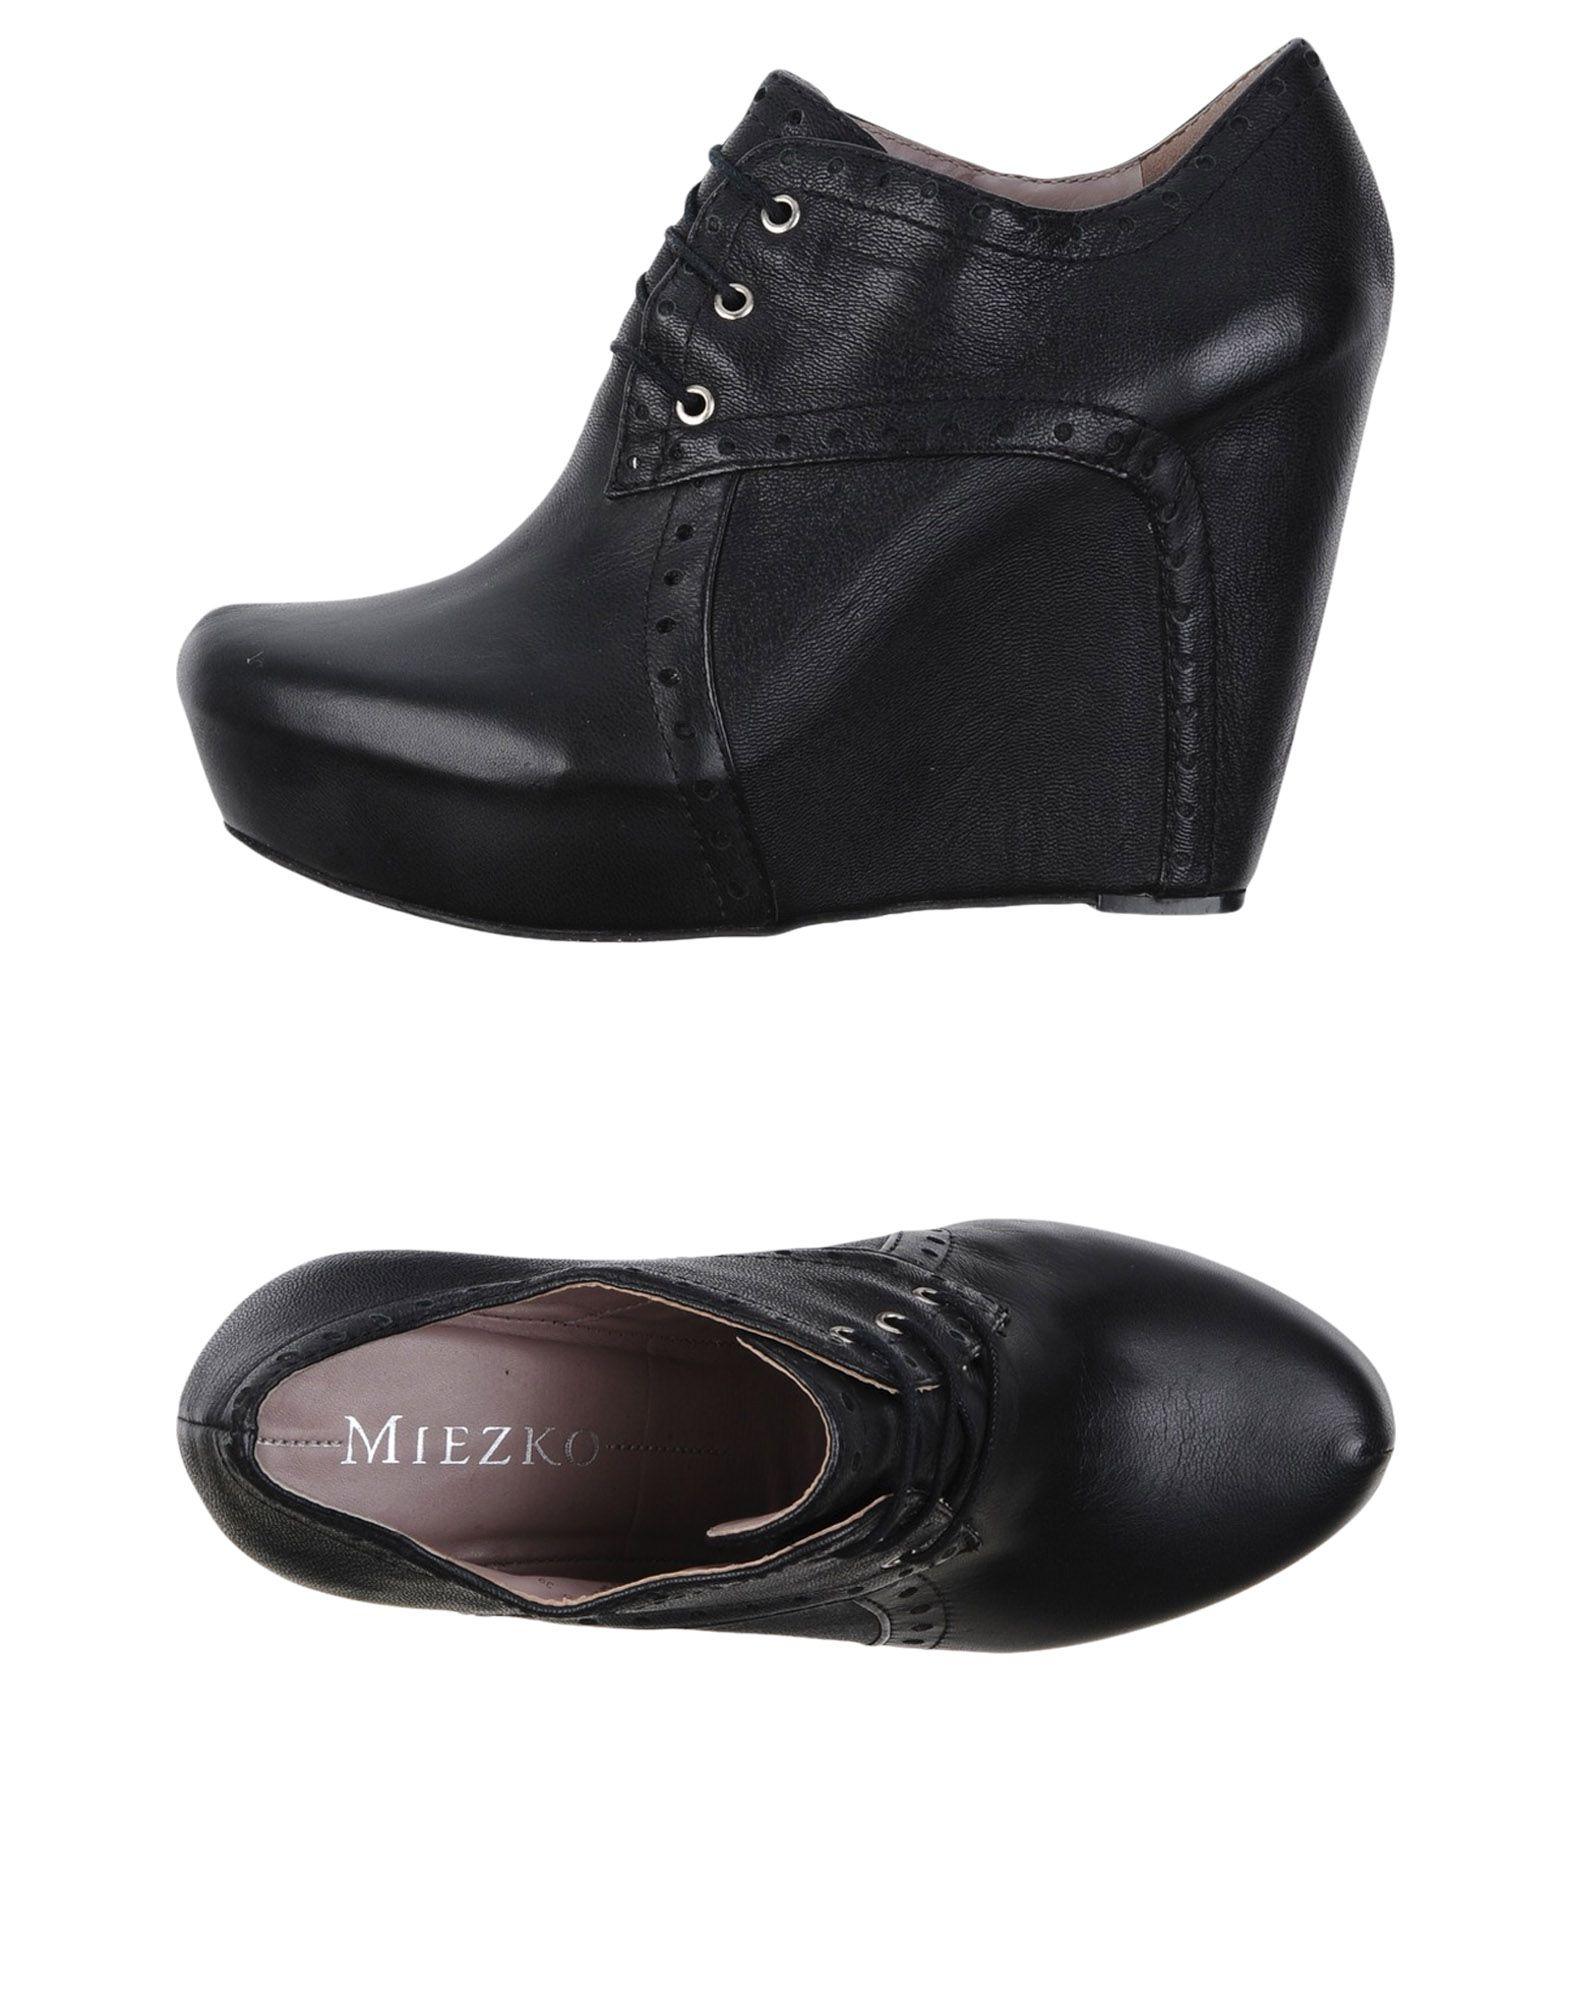 Gut um Damen billige Schuhe zu tragenMiezko Schnürschuhe Damen um  11284346BJ 6b0f26